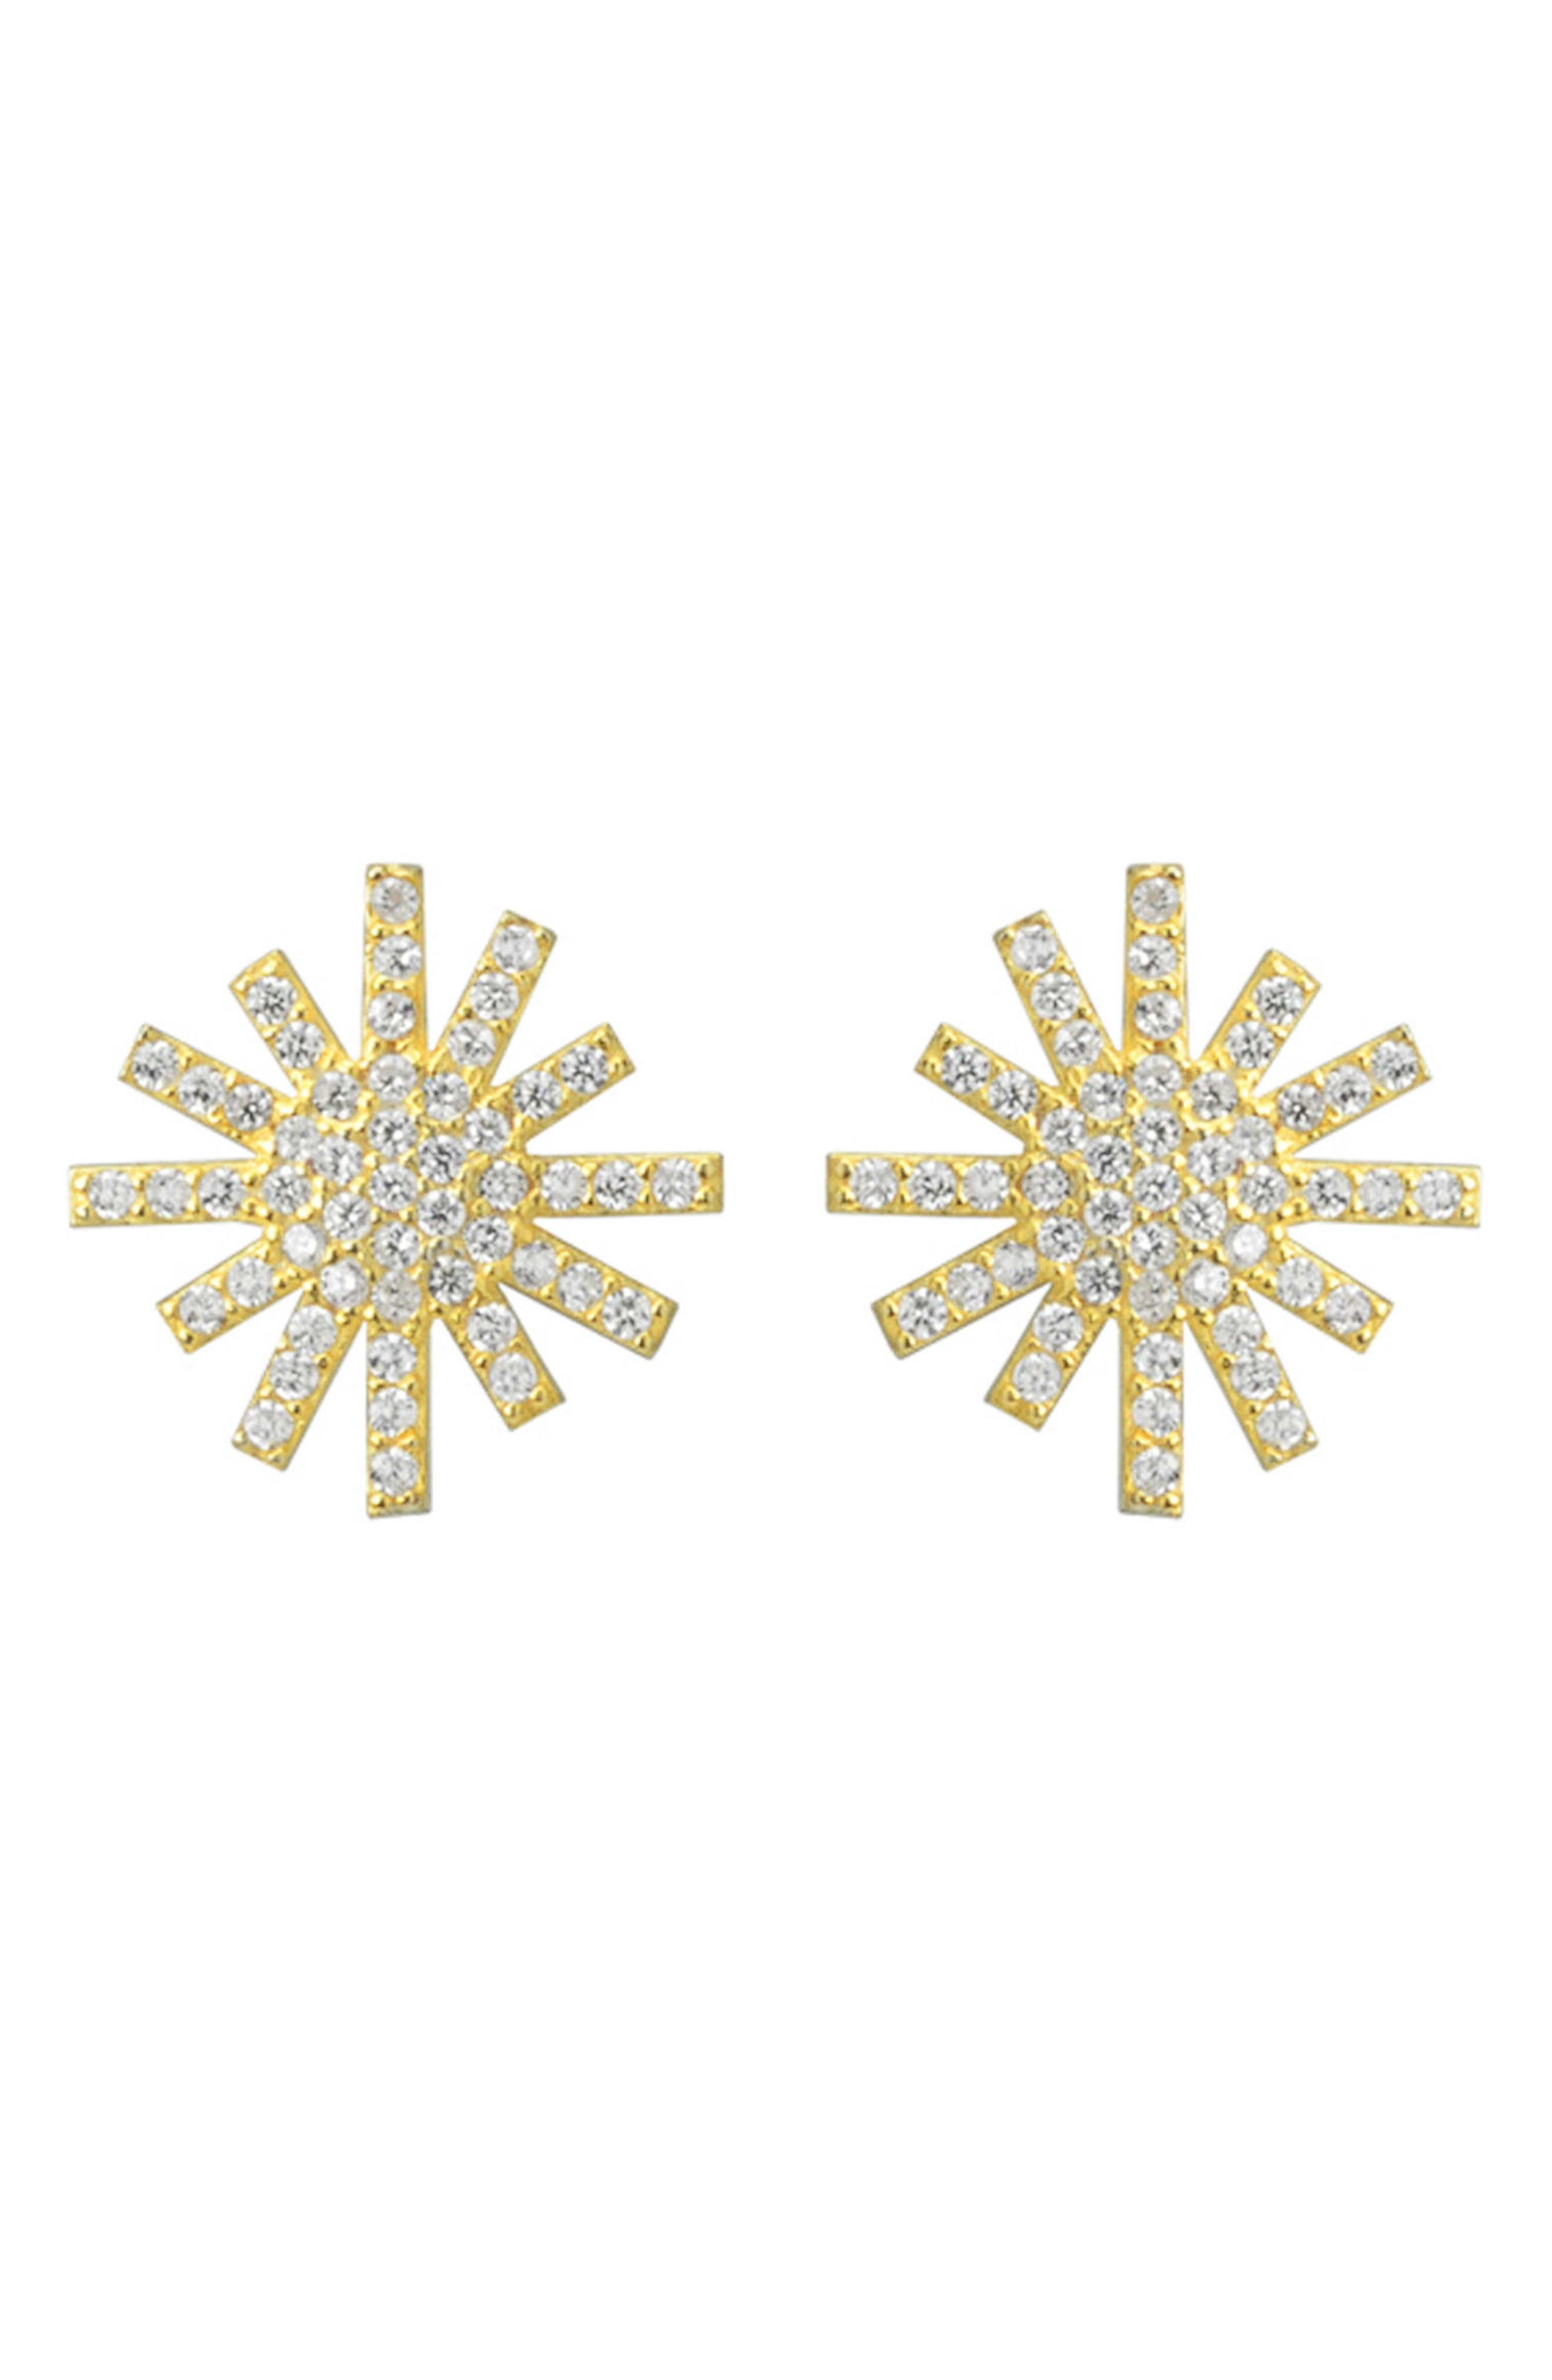 Starburst Stud Earrings,                             Main thumbnail 1, color,                             710